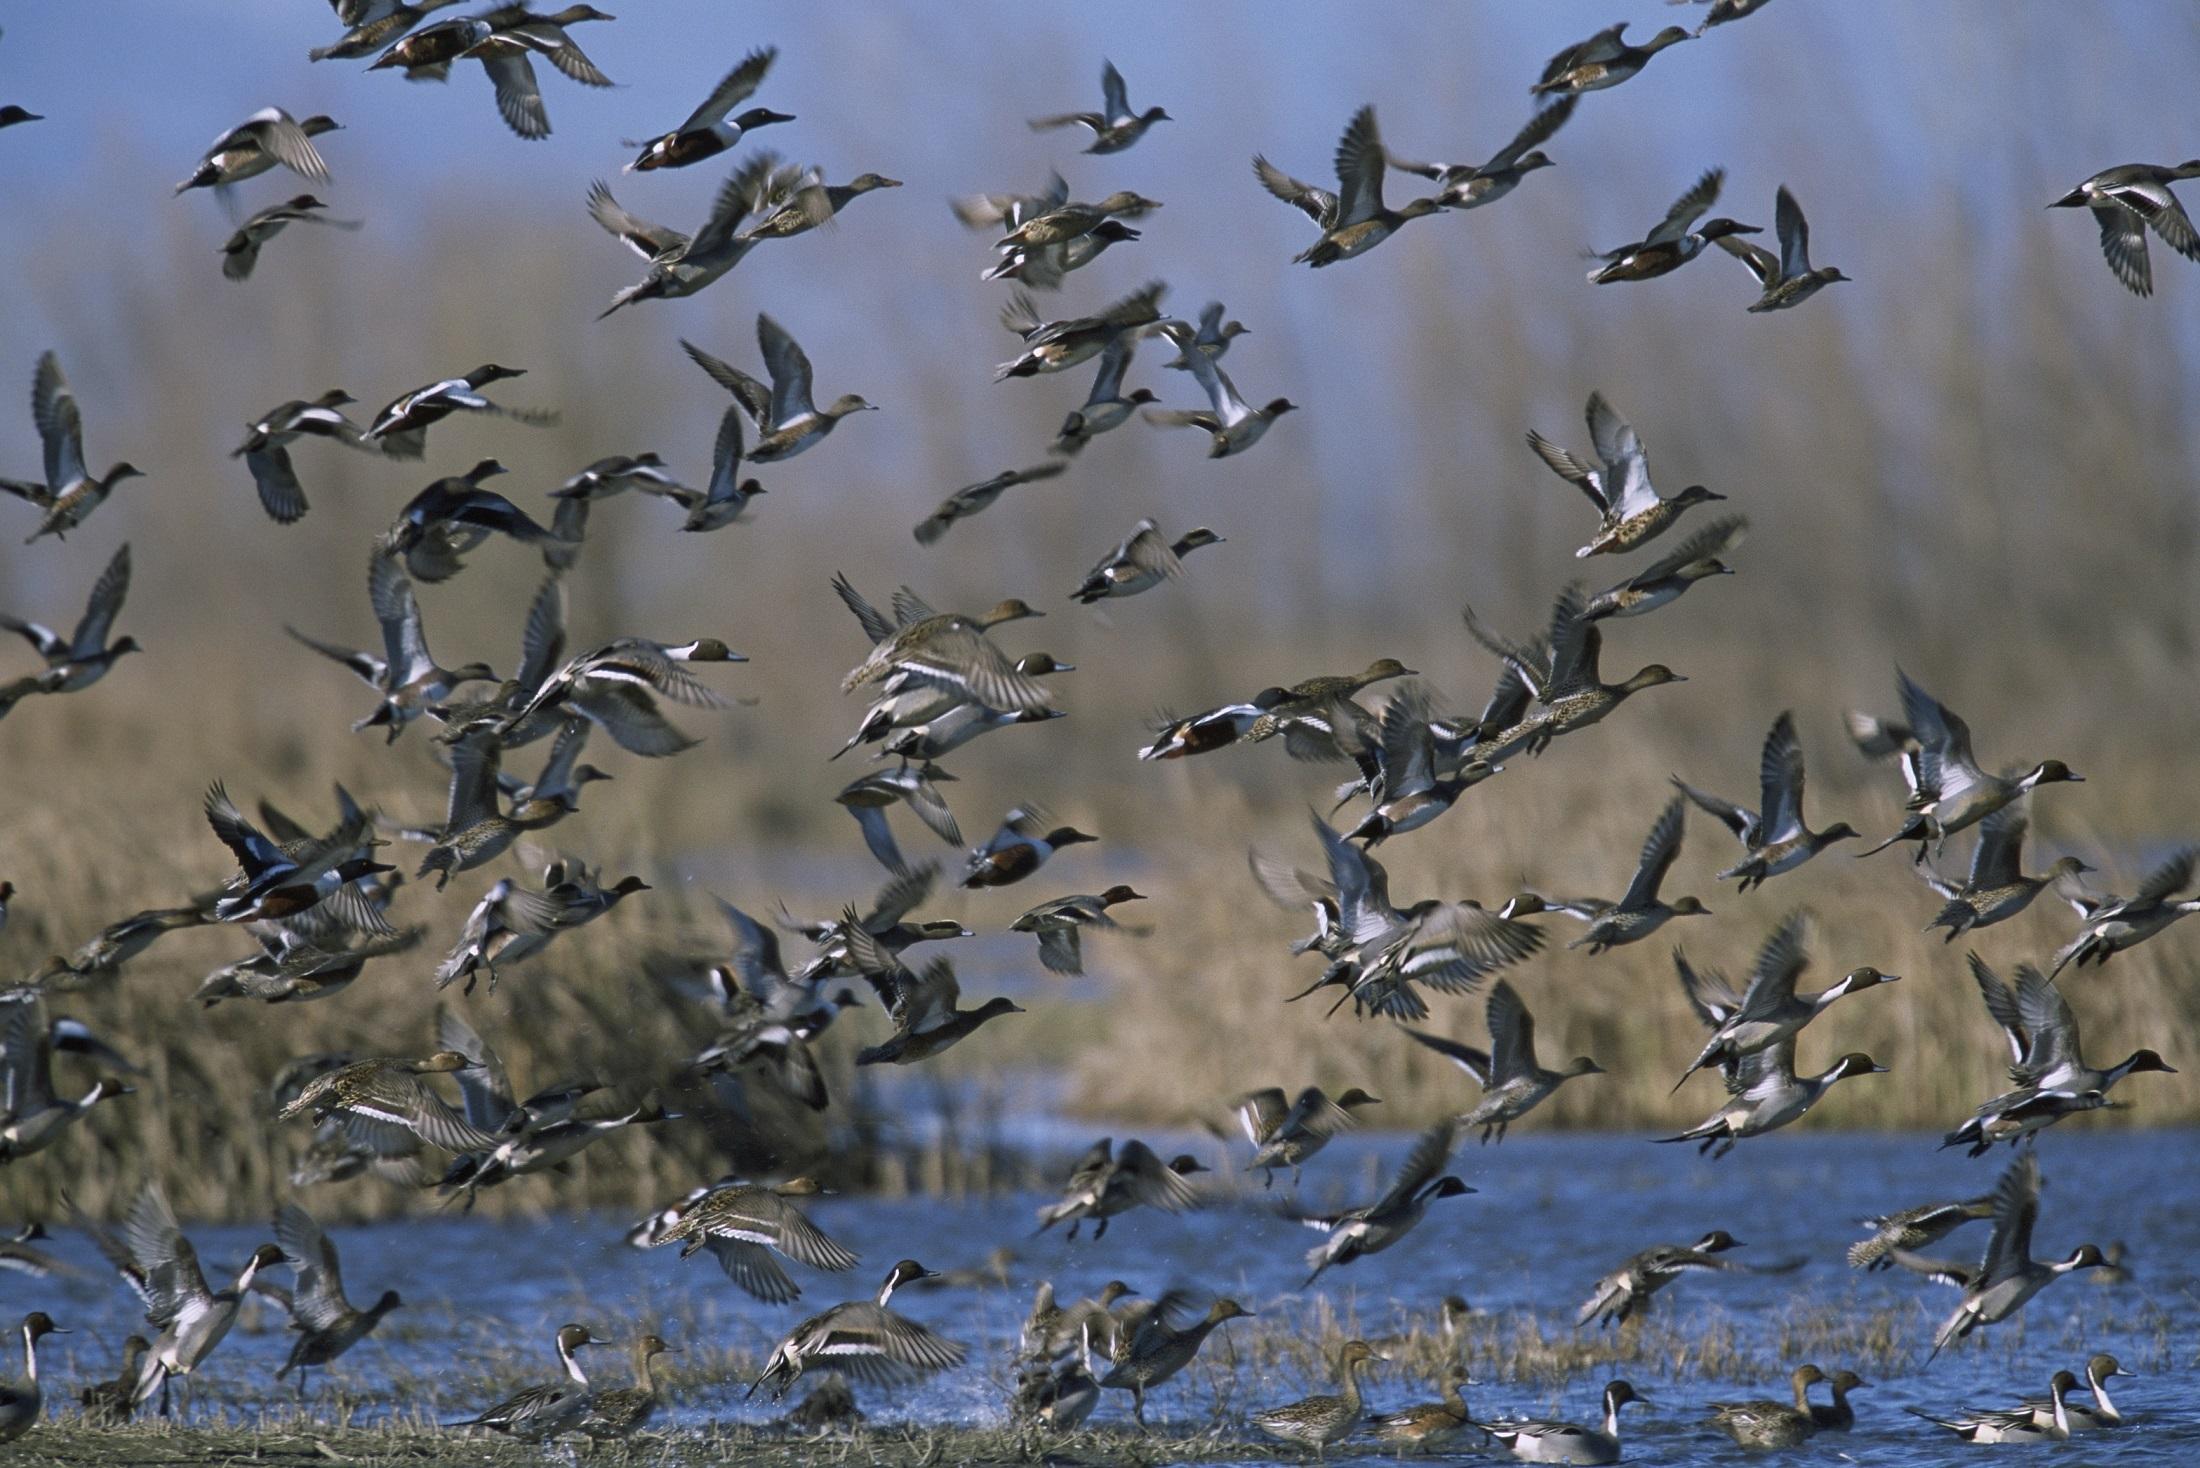 Mixed Duck Flock, Animal, Bird, Duck, Flock, HQ Photo